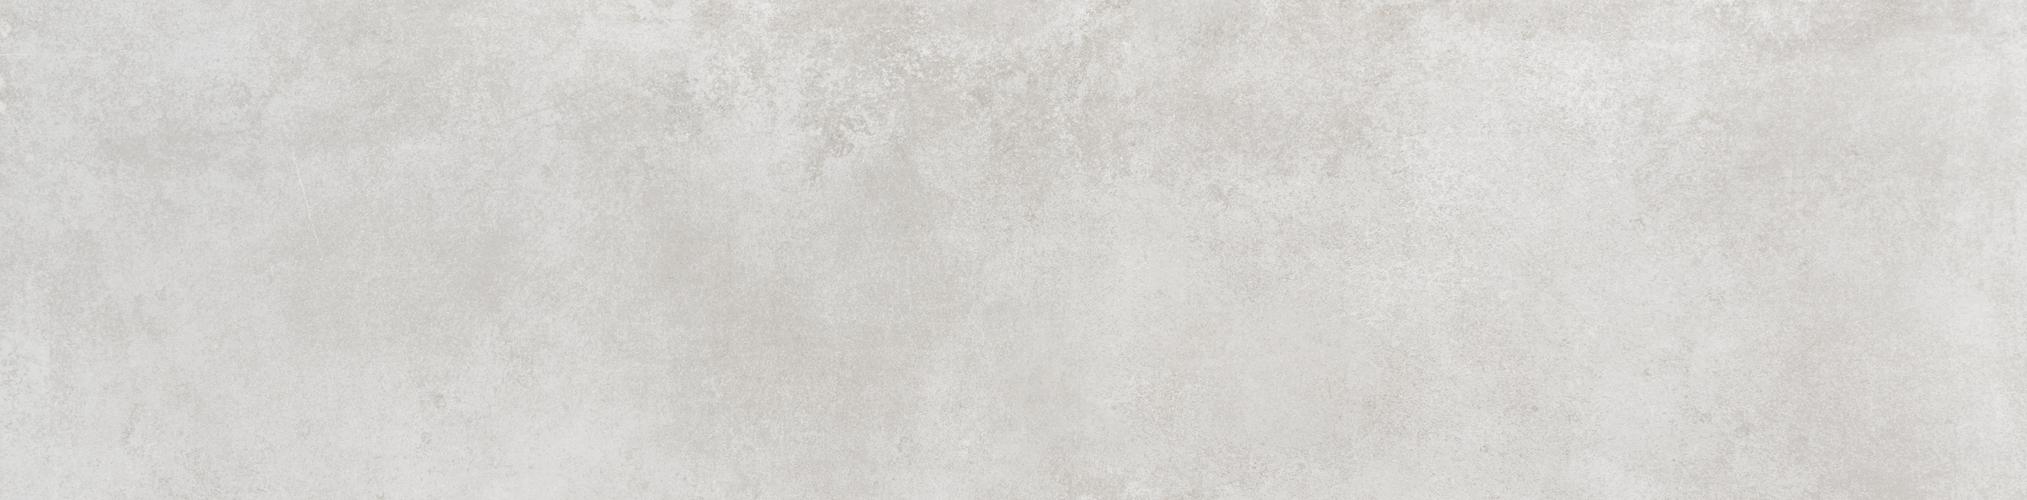 Track Blanco 30x90 cm